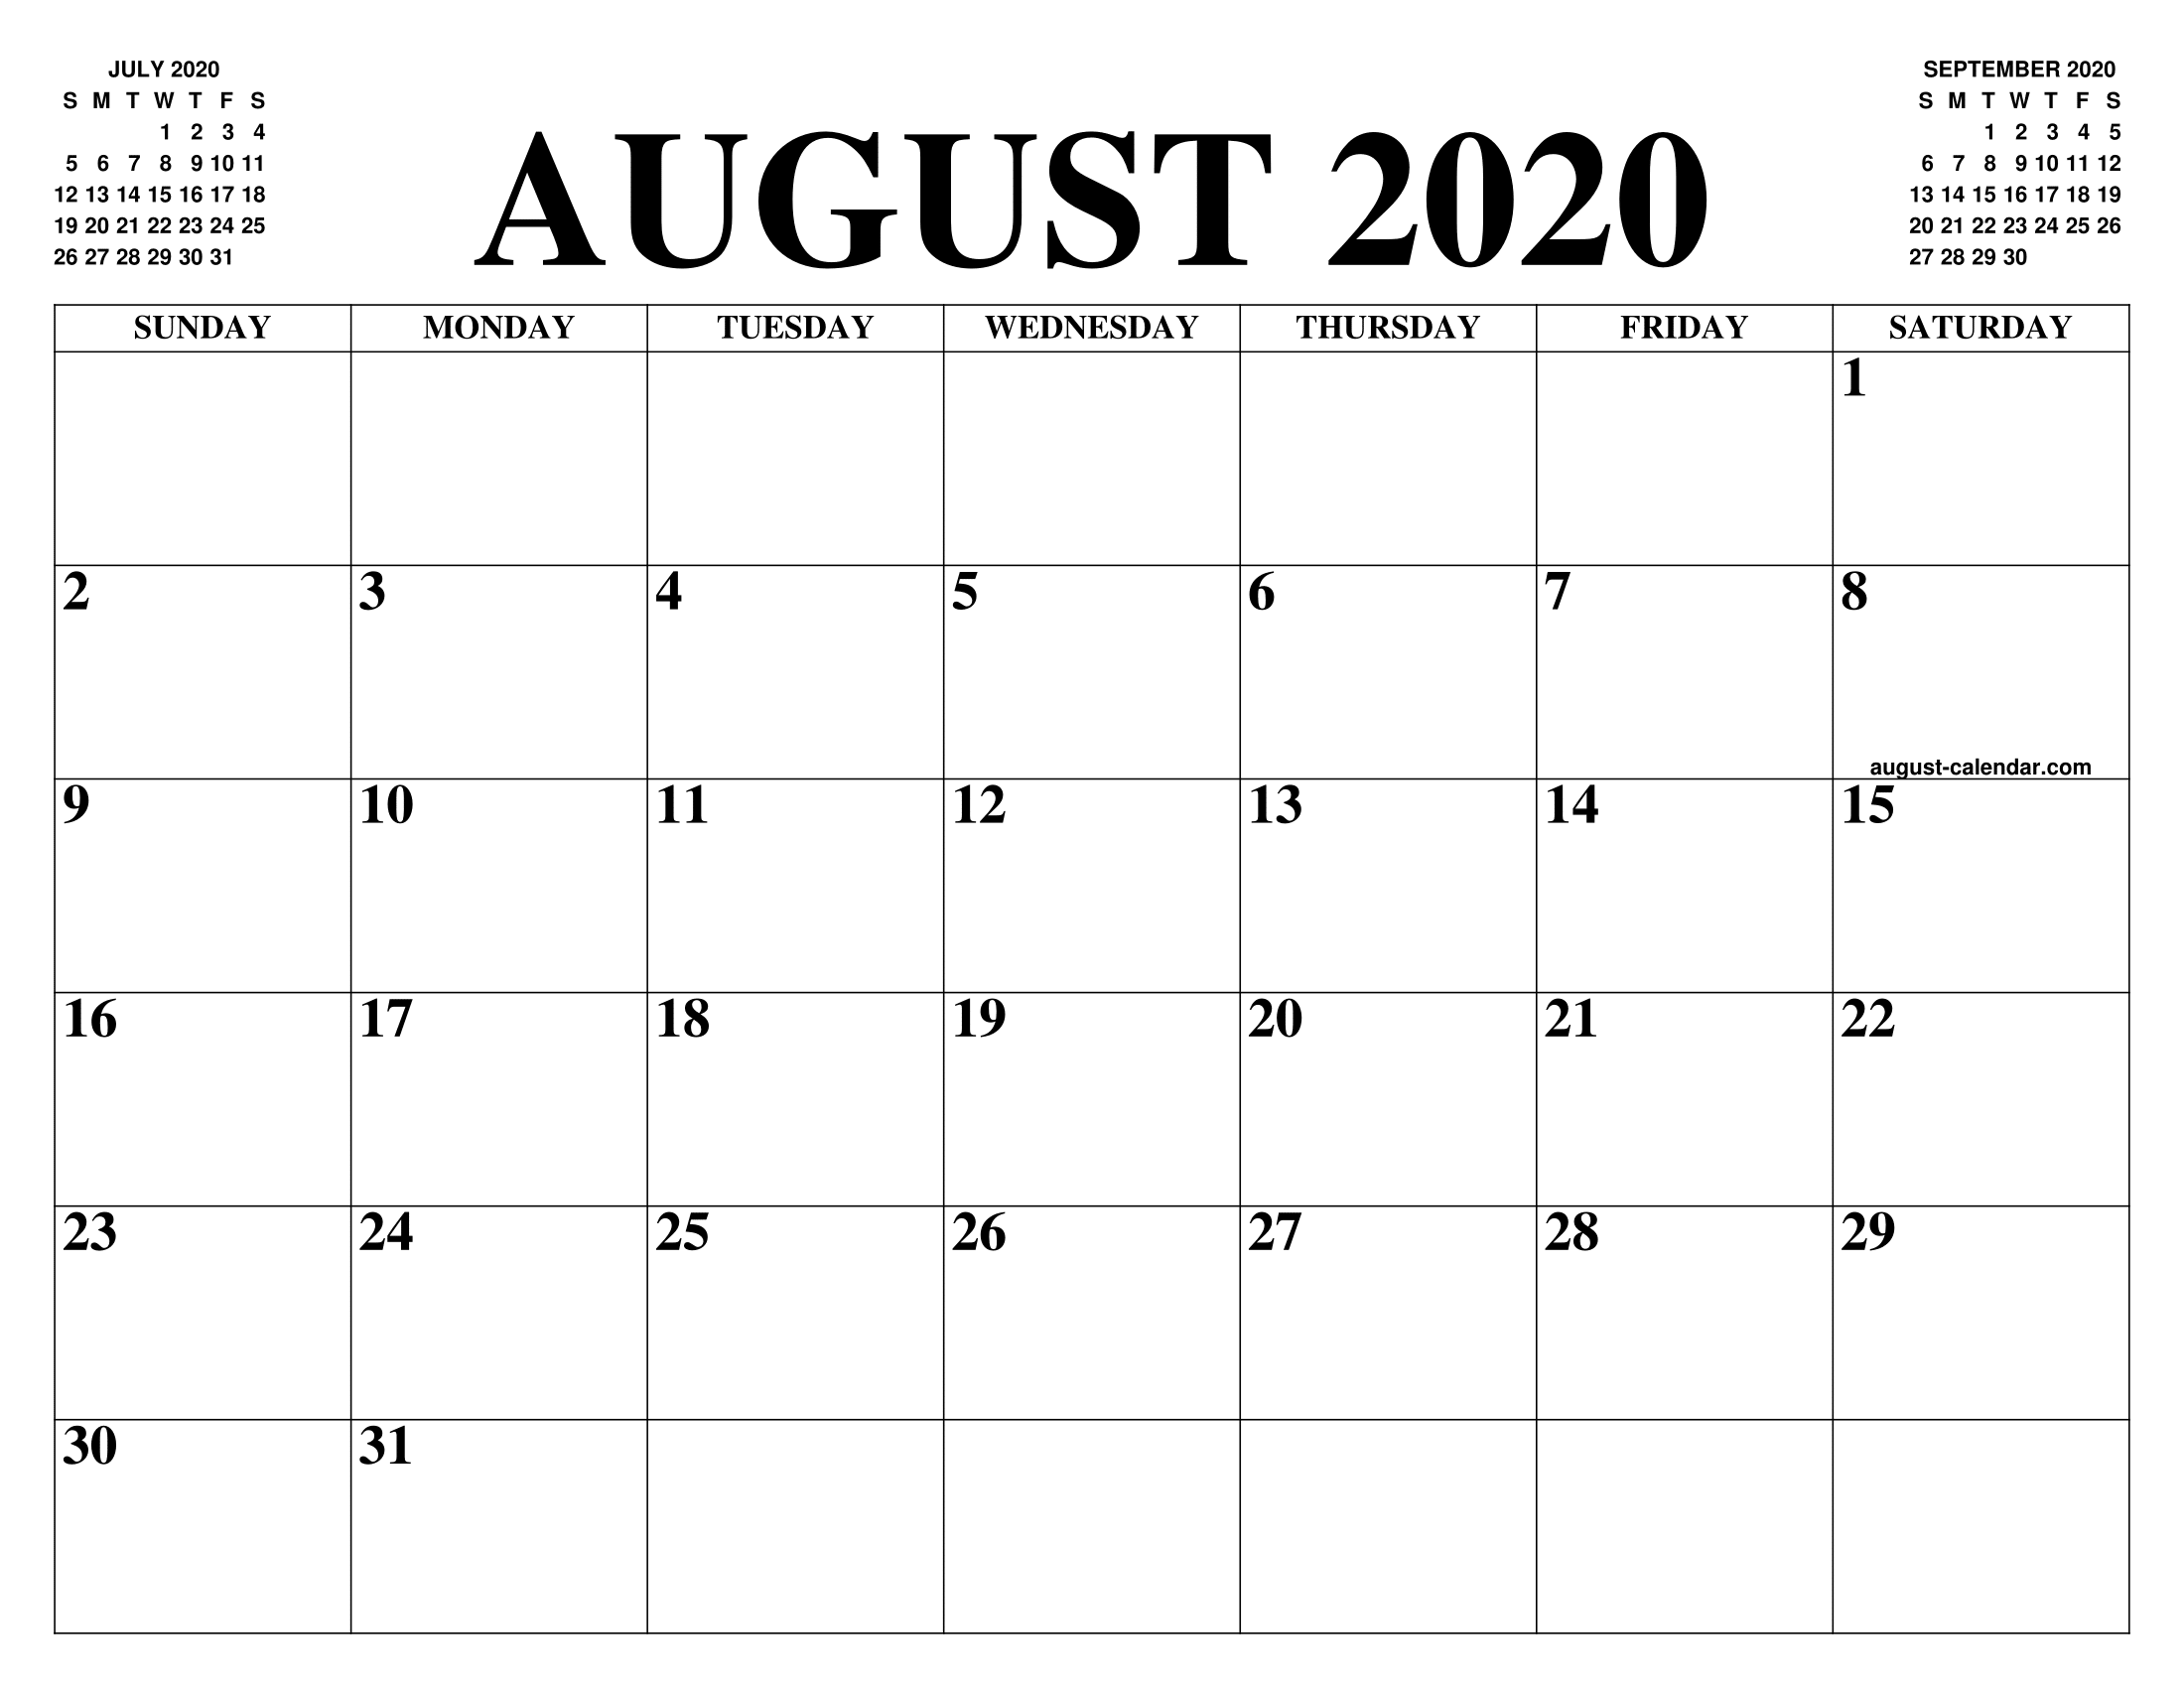 Blank Calendar August 2020.August 2020 Calendar Of The Month Free Printable August Calendar Of